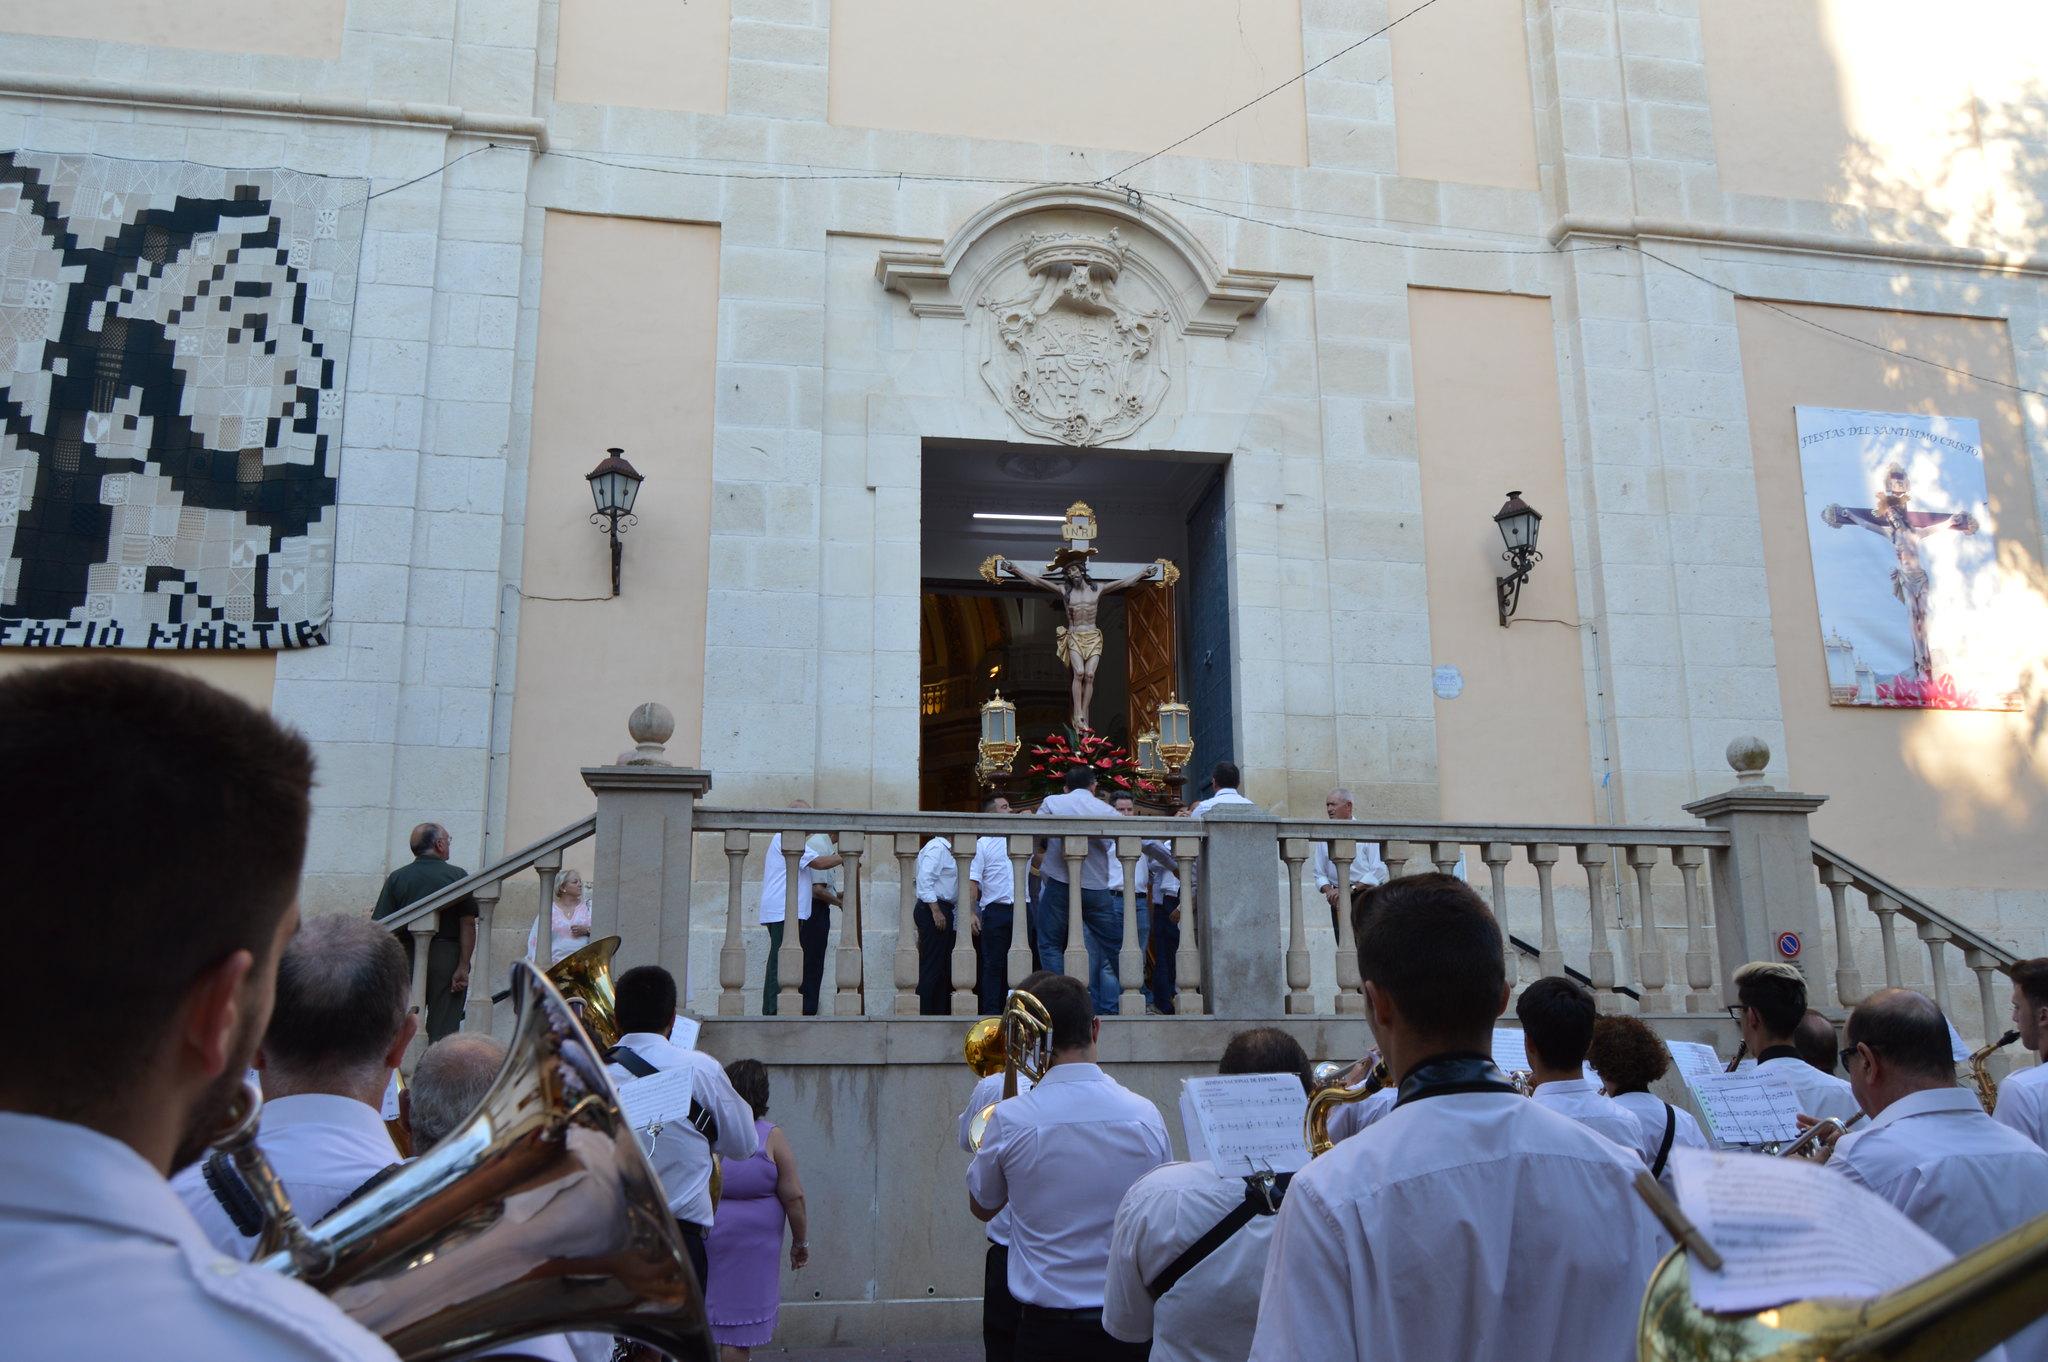 (2017-07-02) Procesión de subida (Adrián Romero Montesinos) (2)